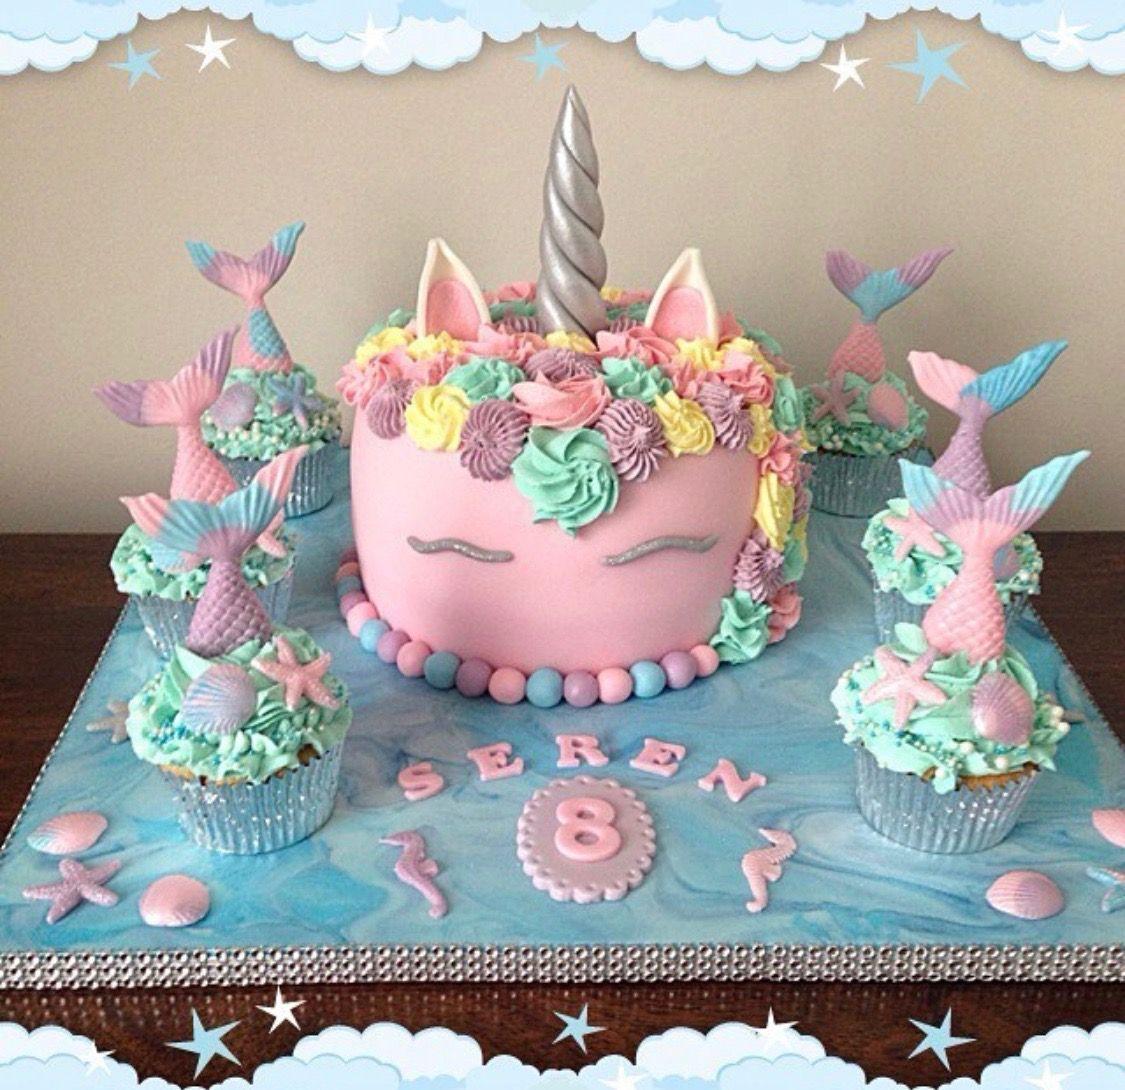 Mermicorn Cake Mermaid Cake Unicorn Cake Magical Cake With